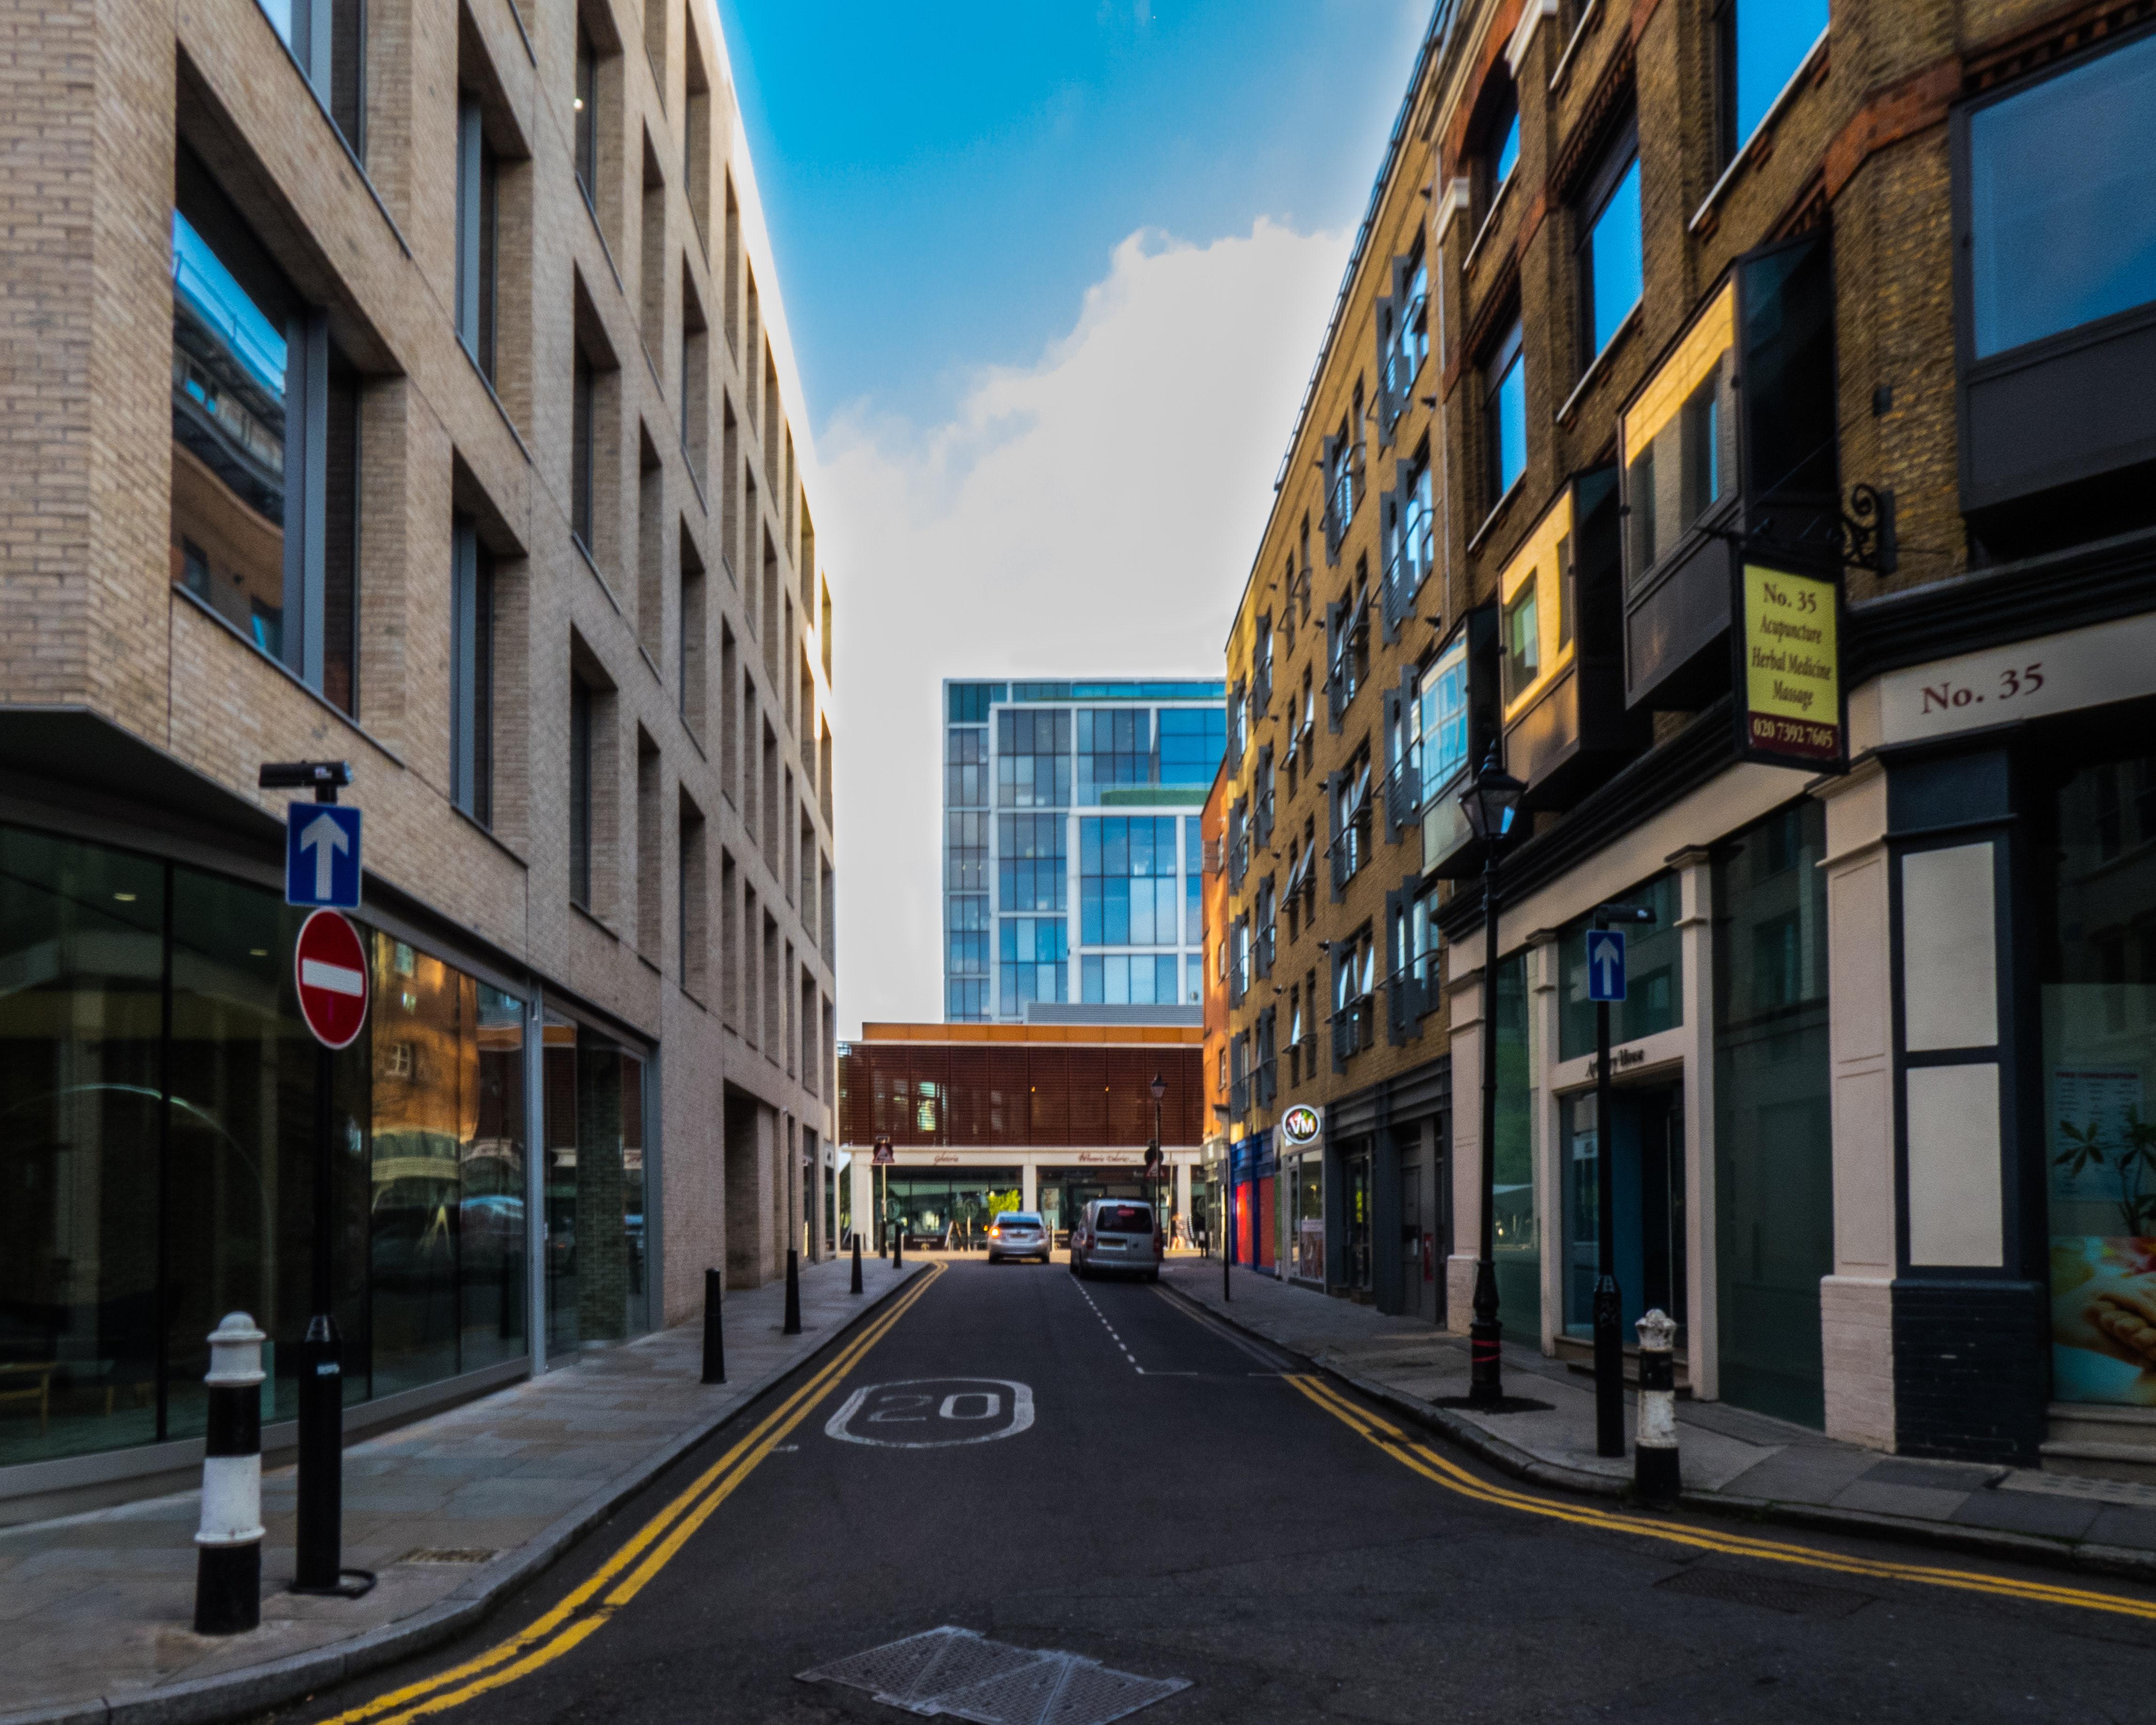 free stock photo of london londres oxford street